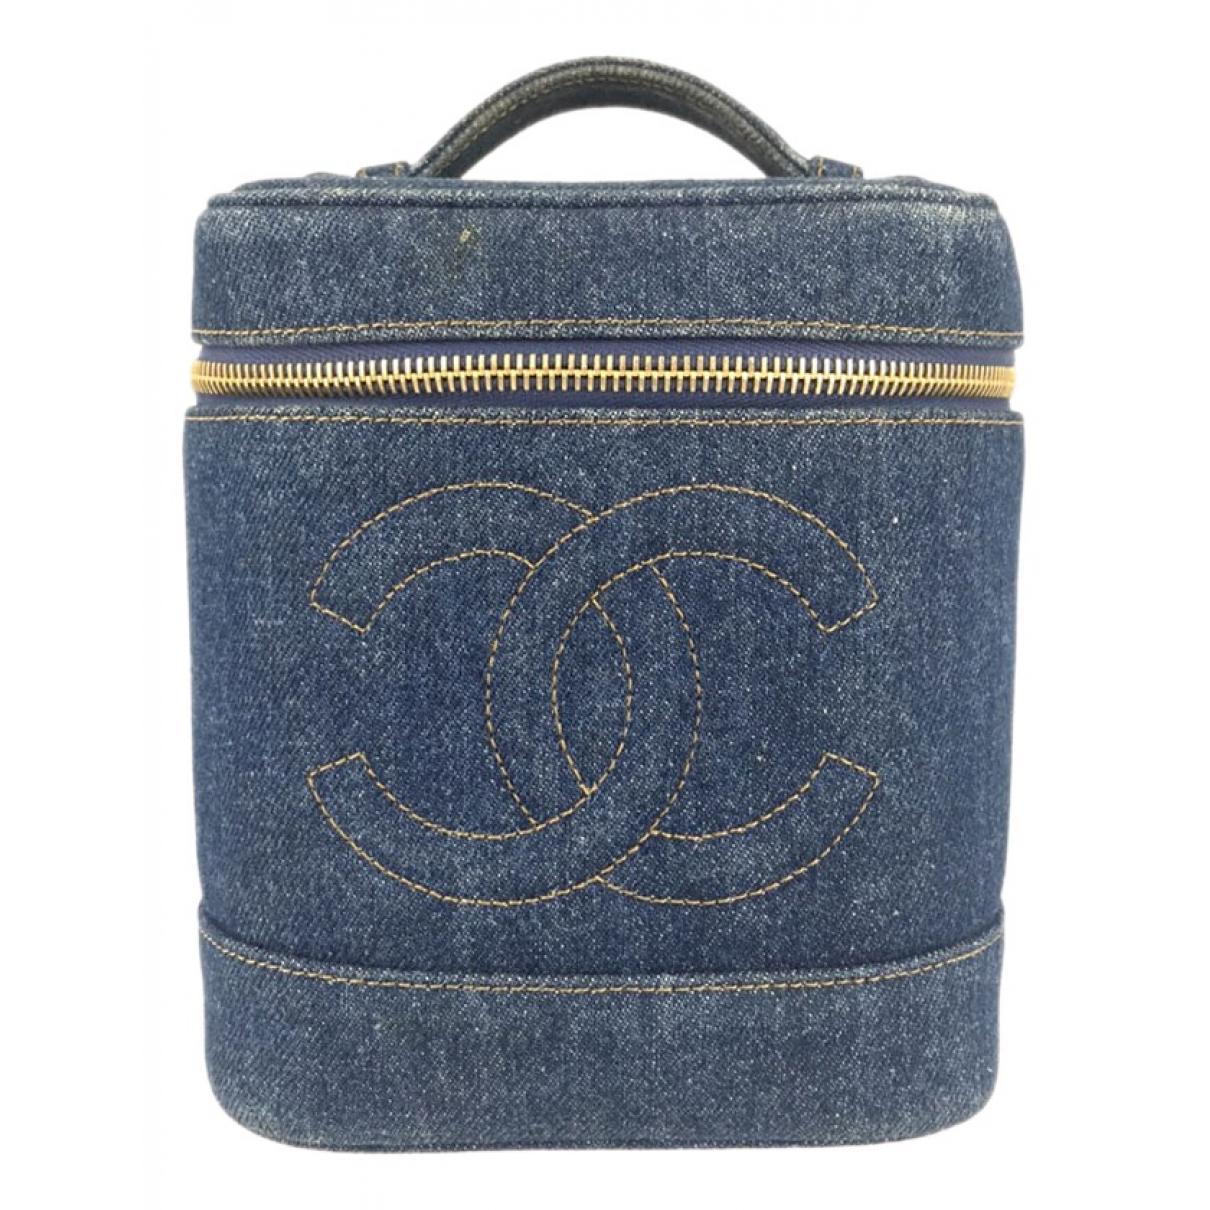 Chanel N Blue Denim - Jeans Travel bag for Women N